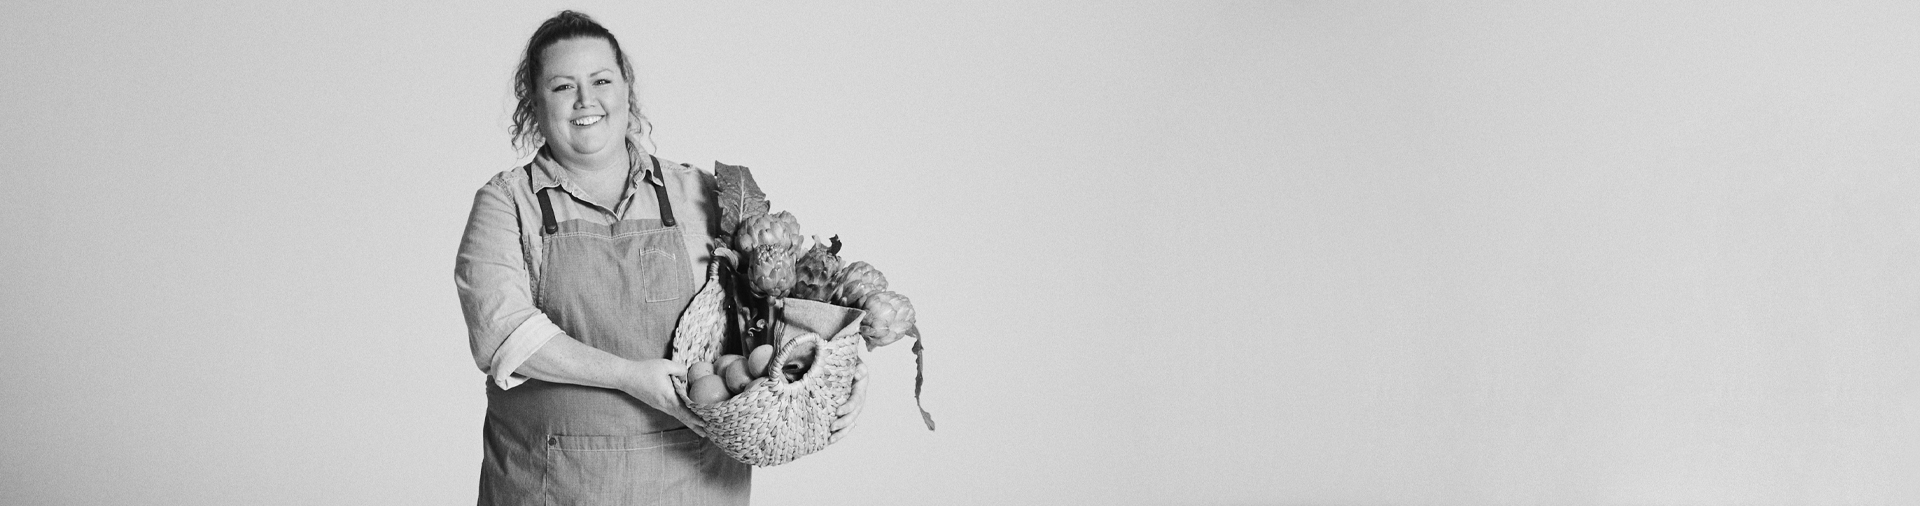 black-and-white-image-of-natalie-jaeger-holding-basket-of-produce-by-kristina-yenko